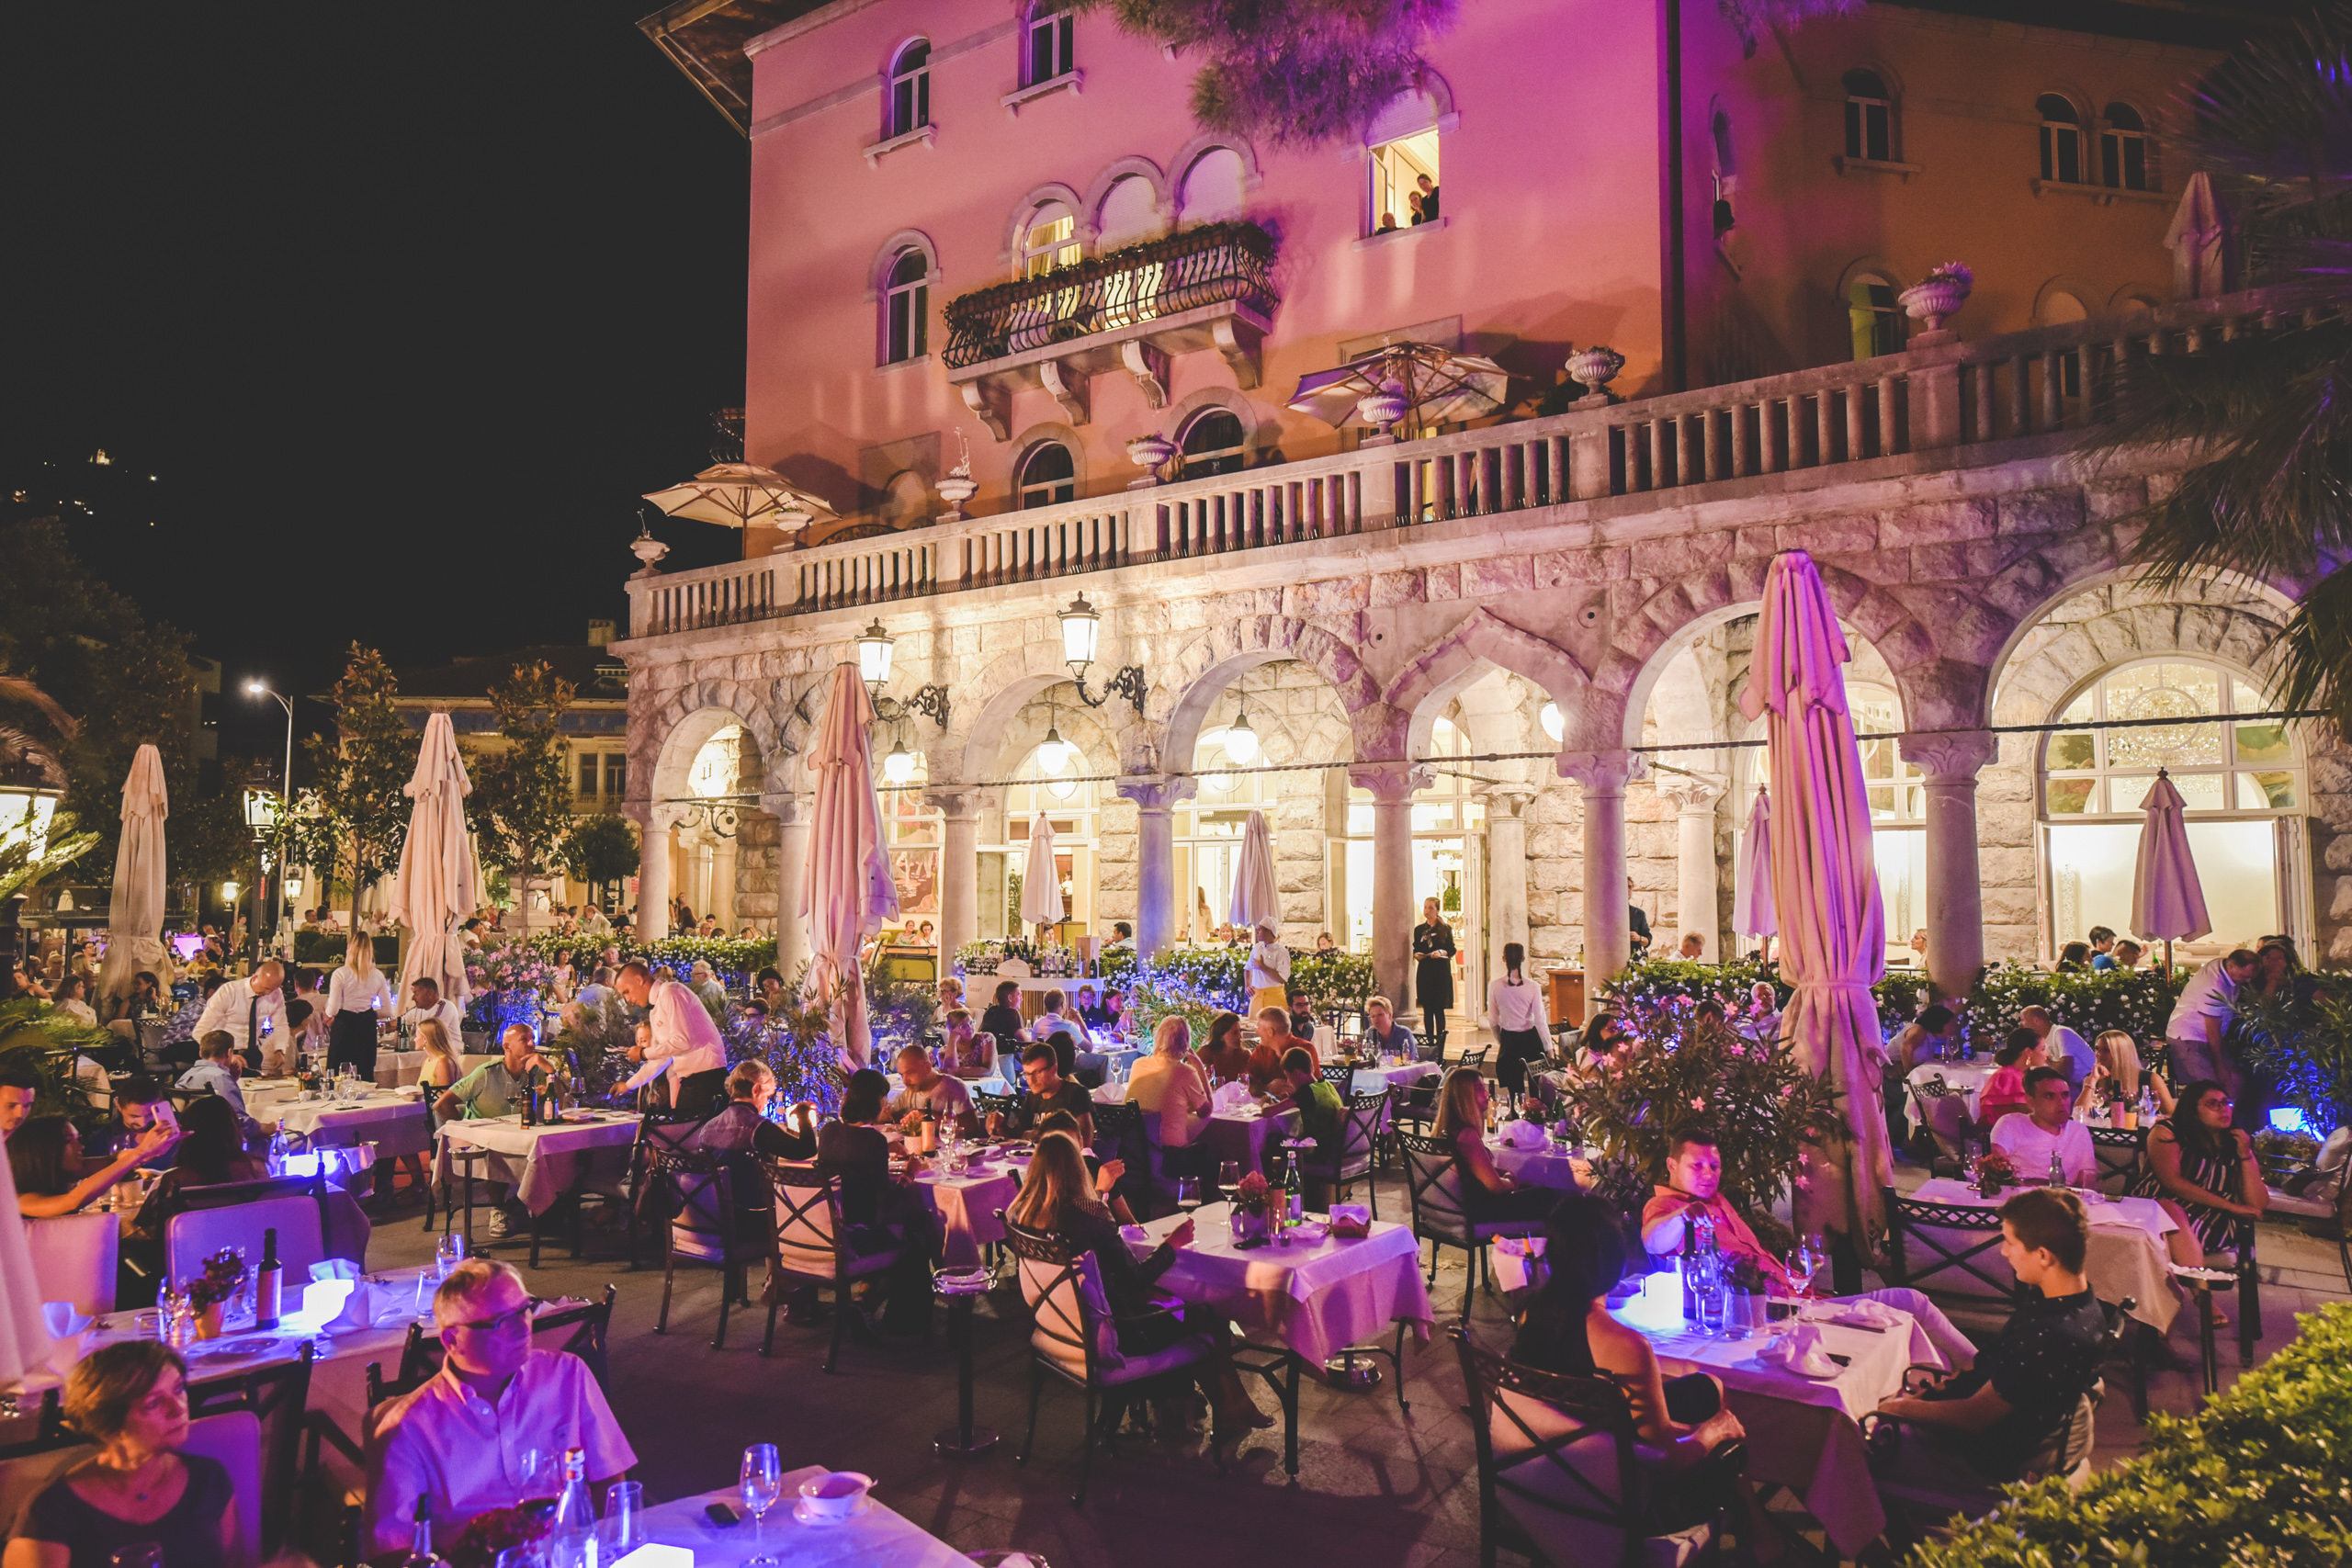 Terasa hotela Milenij